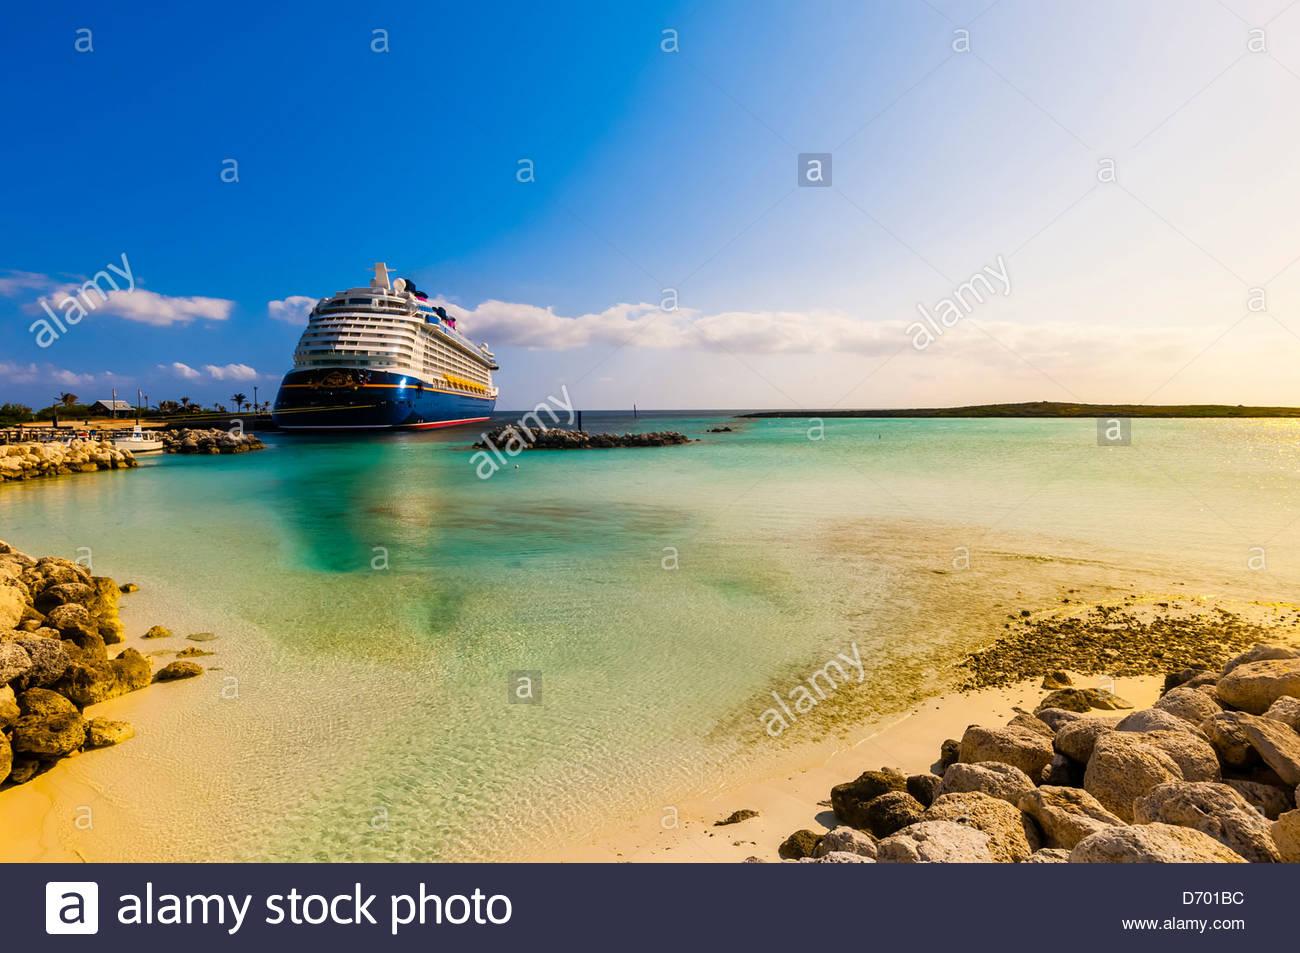 Disney Dream cruise Schiff angedockt an Castaway Cay (Disneys Privatinsel), Bahamas Stockbild